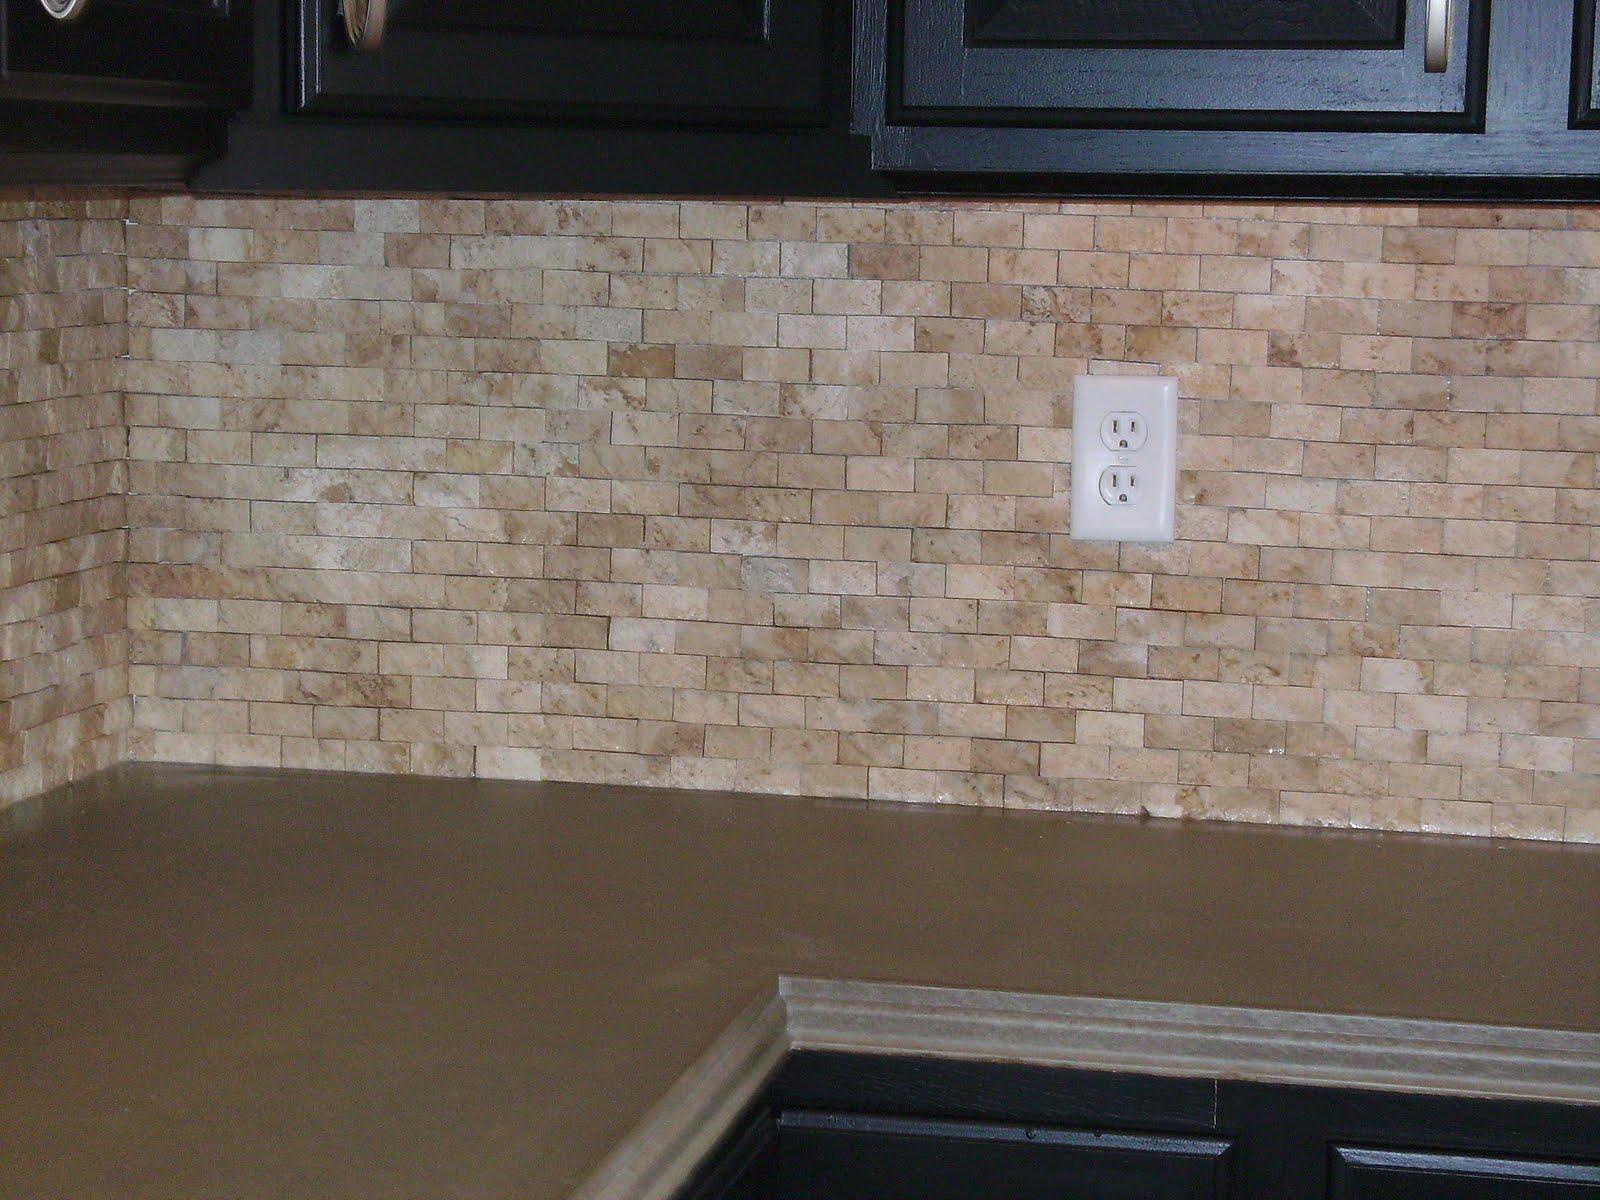 Stone Backsplash Kitchen Average Cost Of Cabinets Knapp Tile And Flooring Inc Split Faced